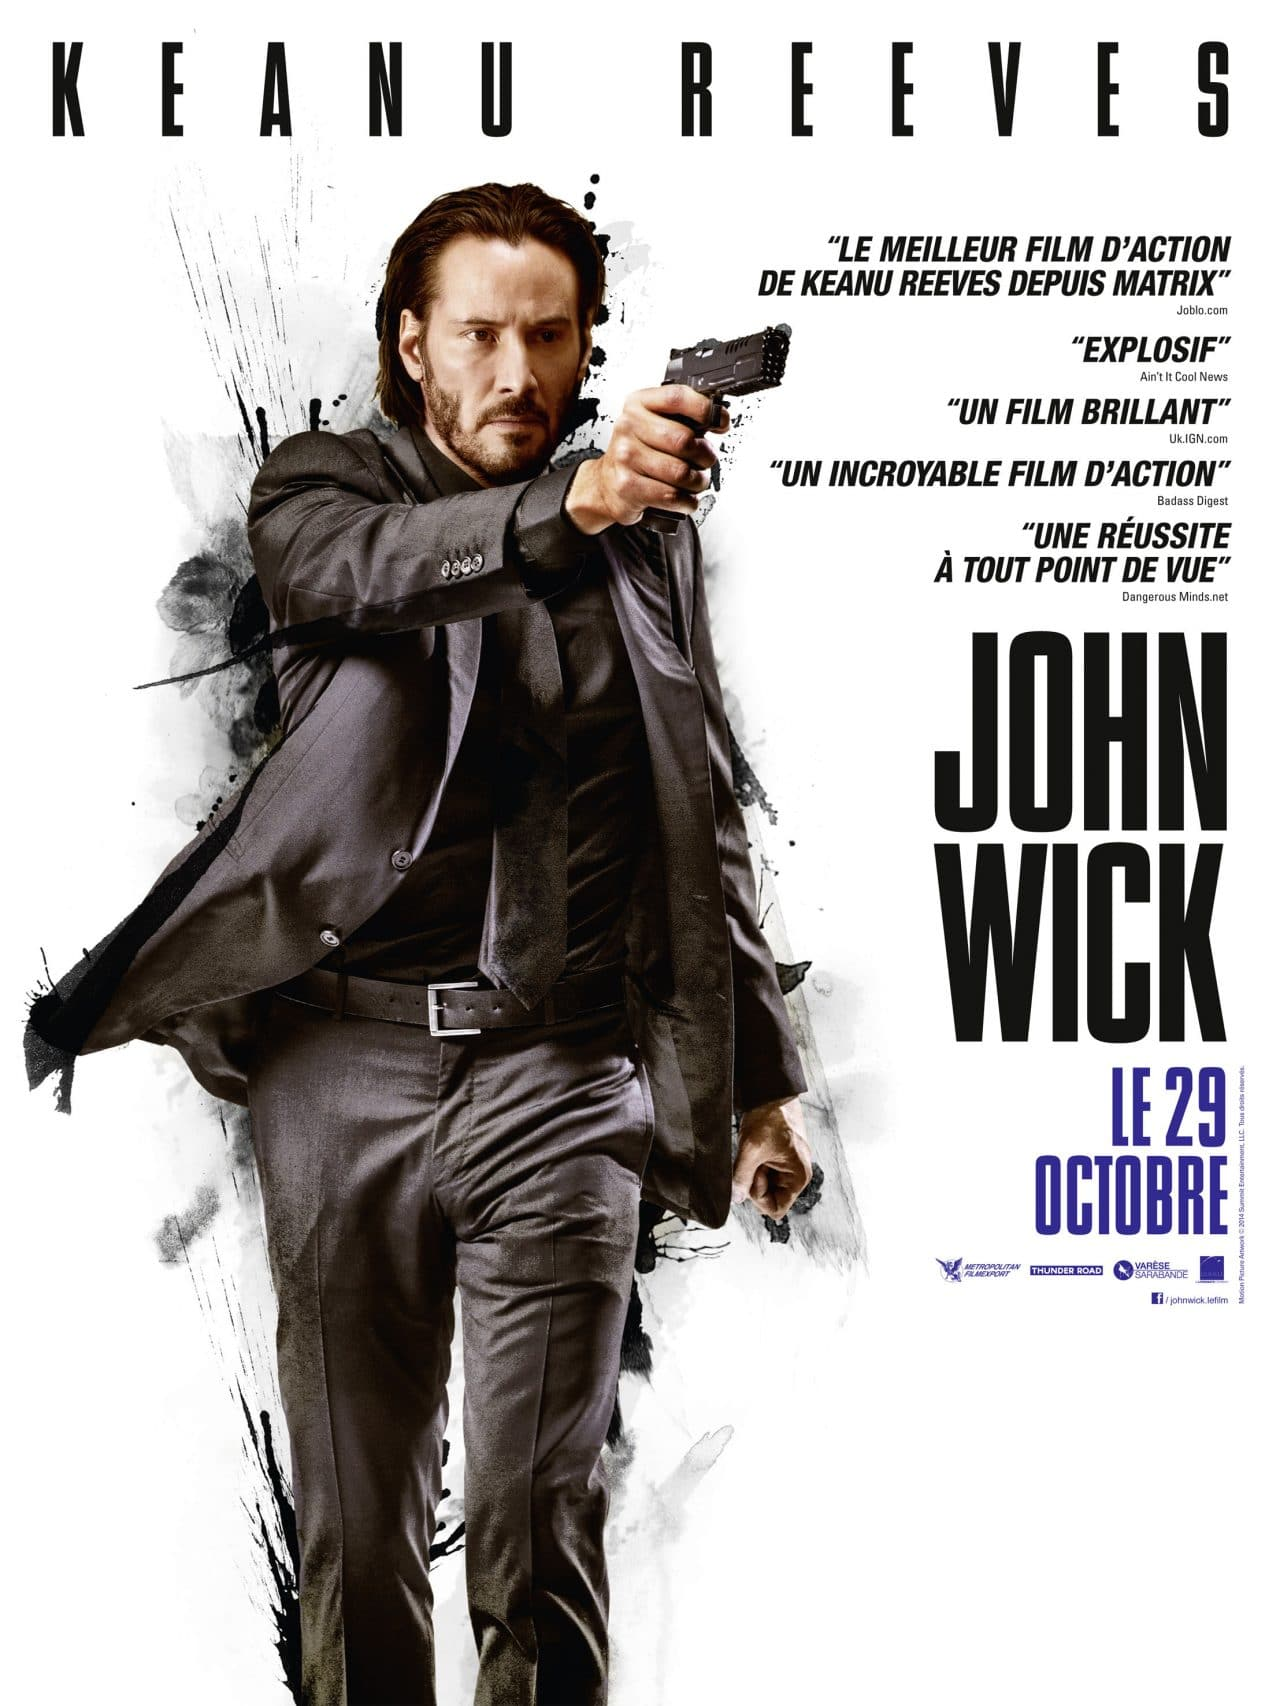 JohnWick_AFFDEF